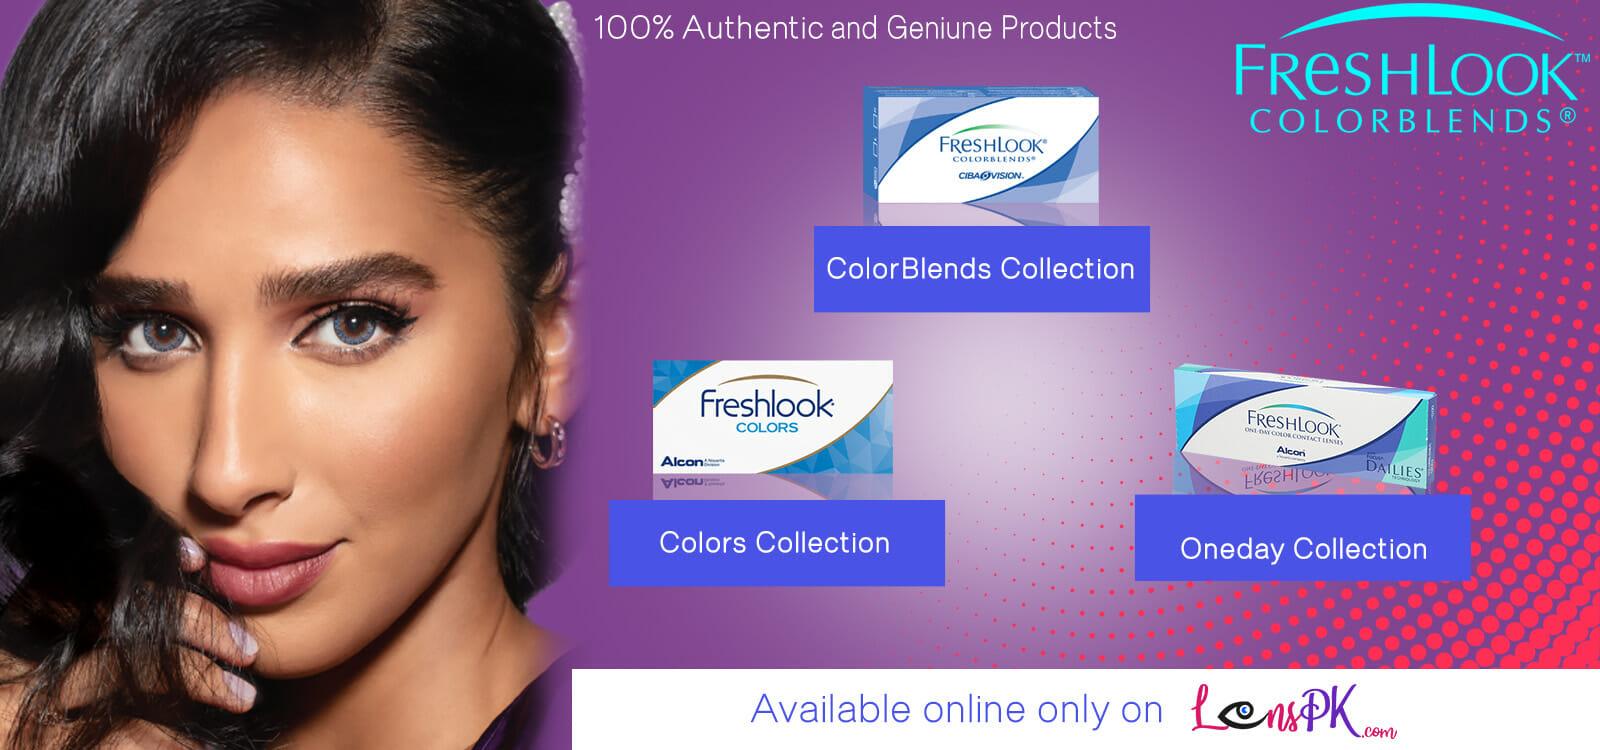 Buy Freshlook Contact Lenses Complete Collection Online - lenspk.com